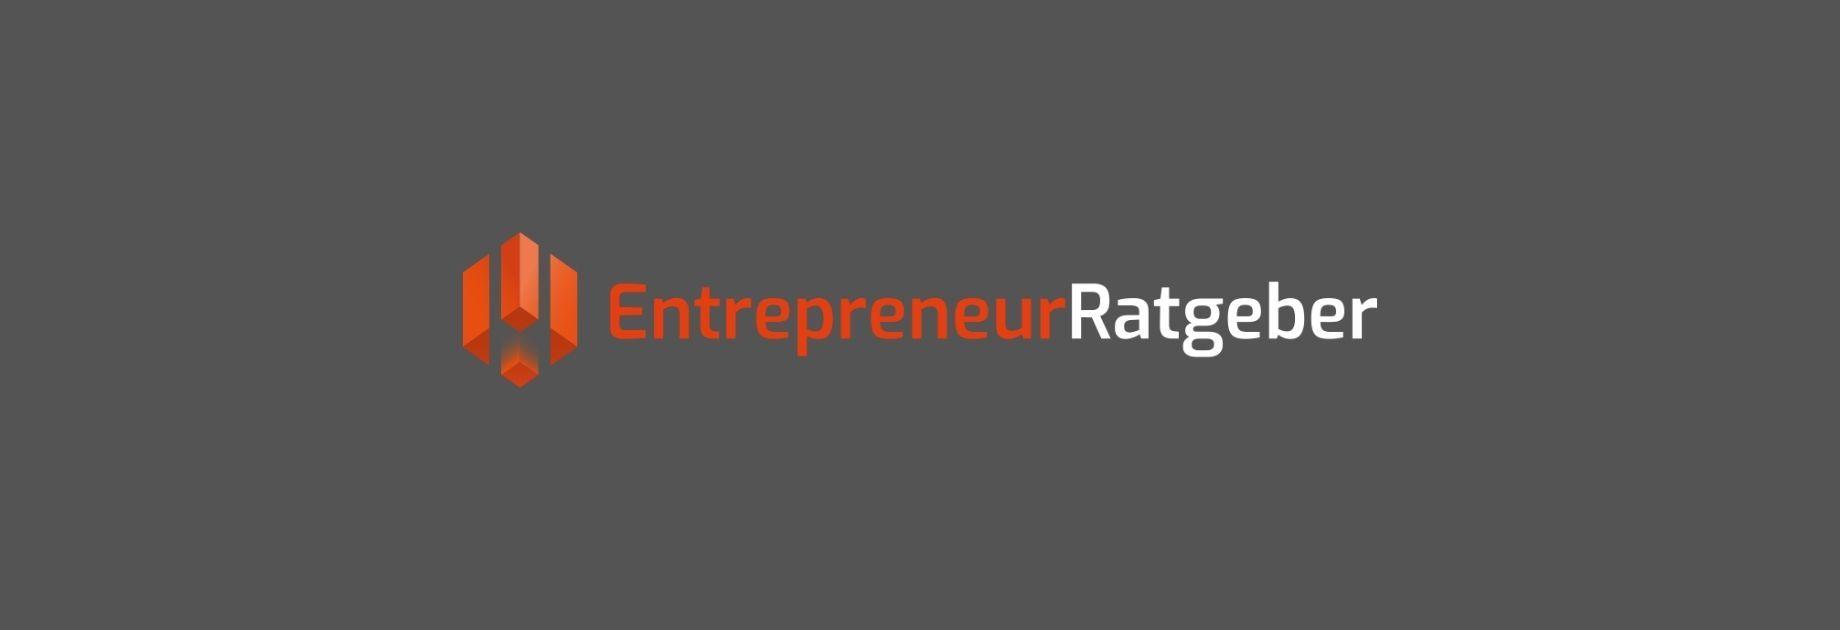 entrepreneur ratgeber